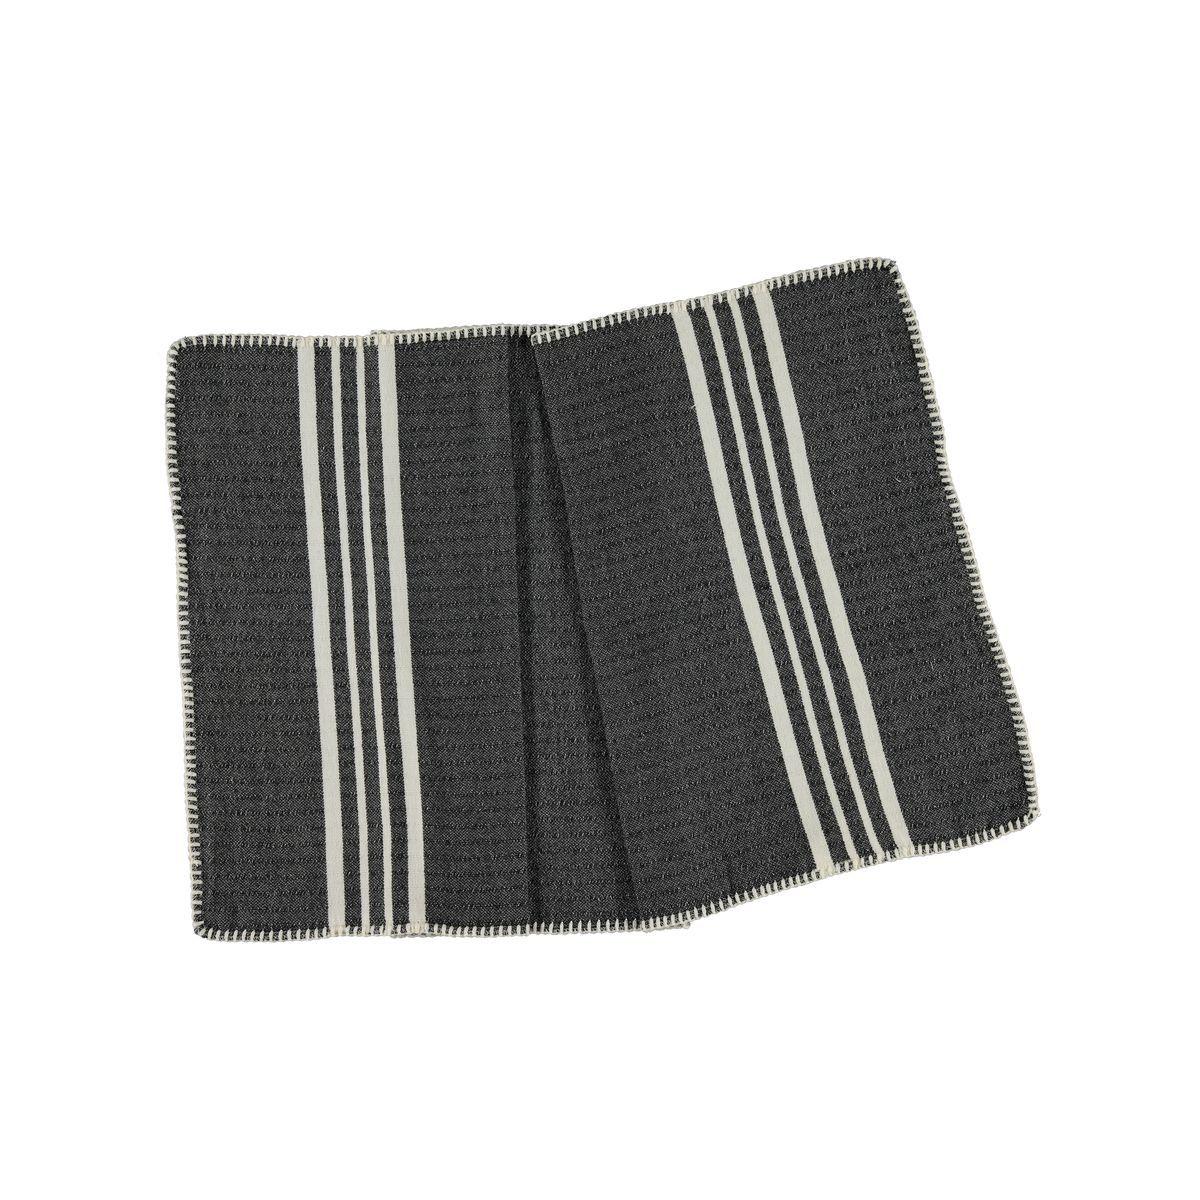 Peshkir Sultan - Stitched / Black